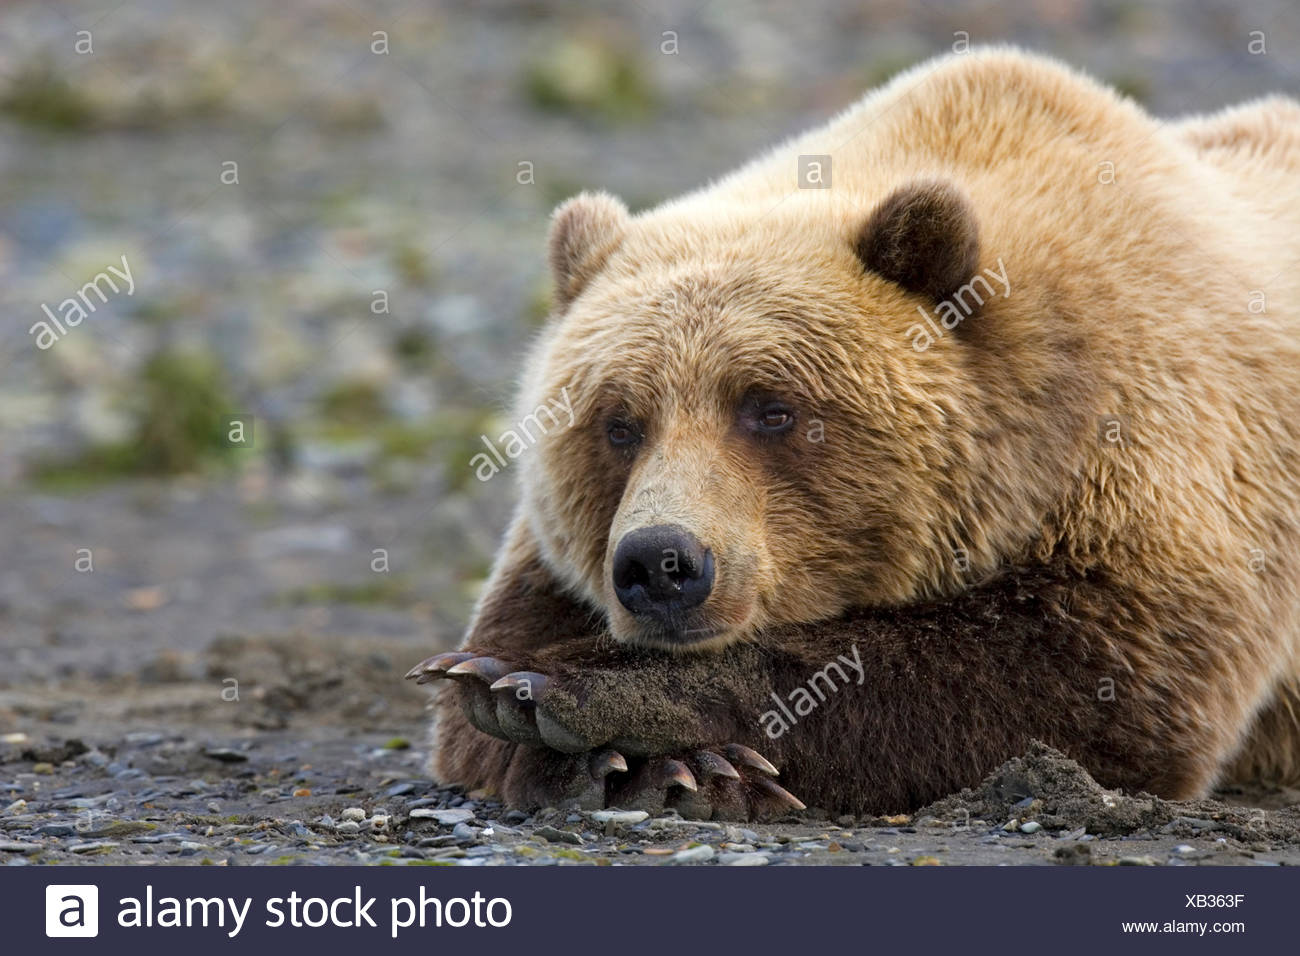 Grizzly Bear - Ursus arctos horribilis - Stock Image